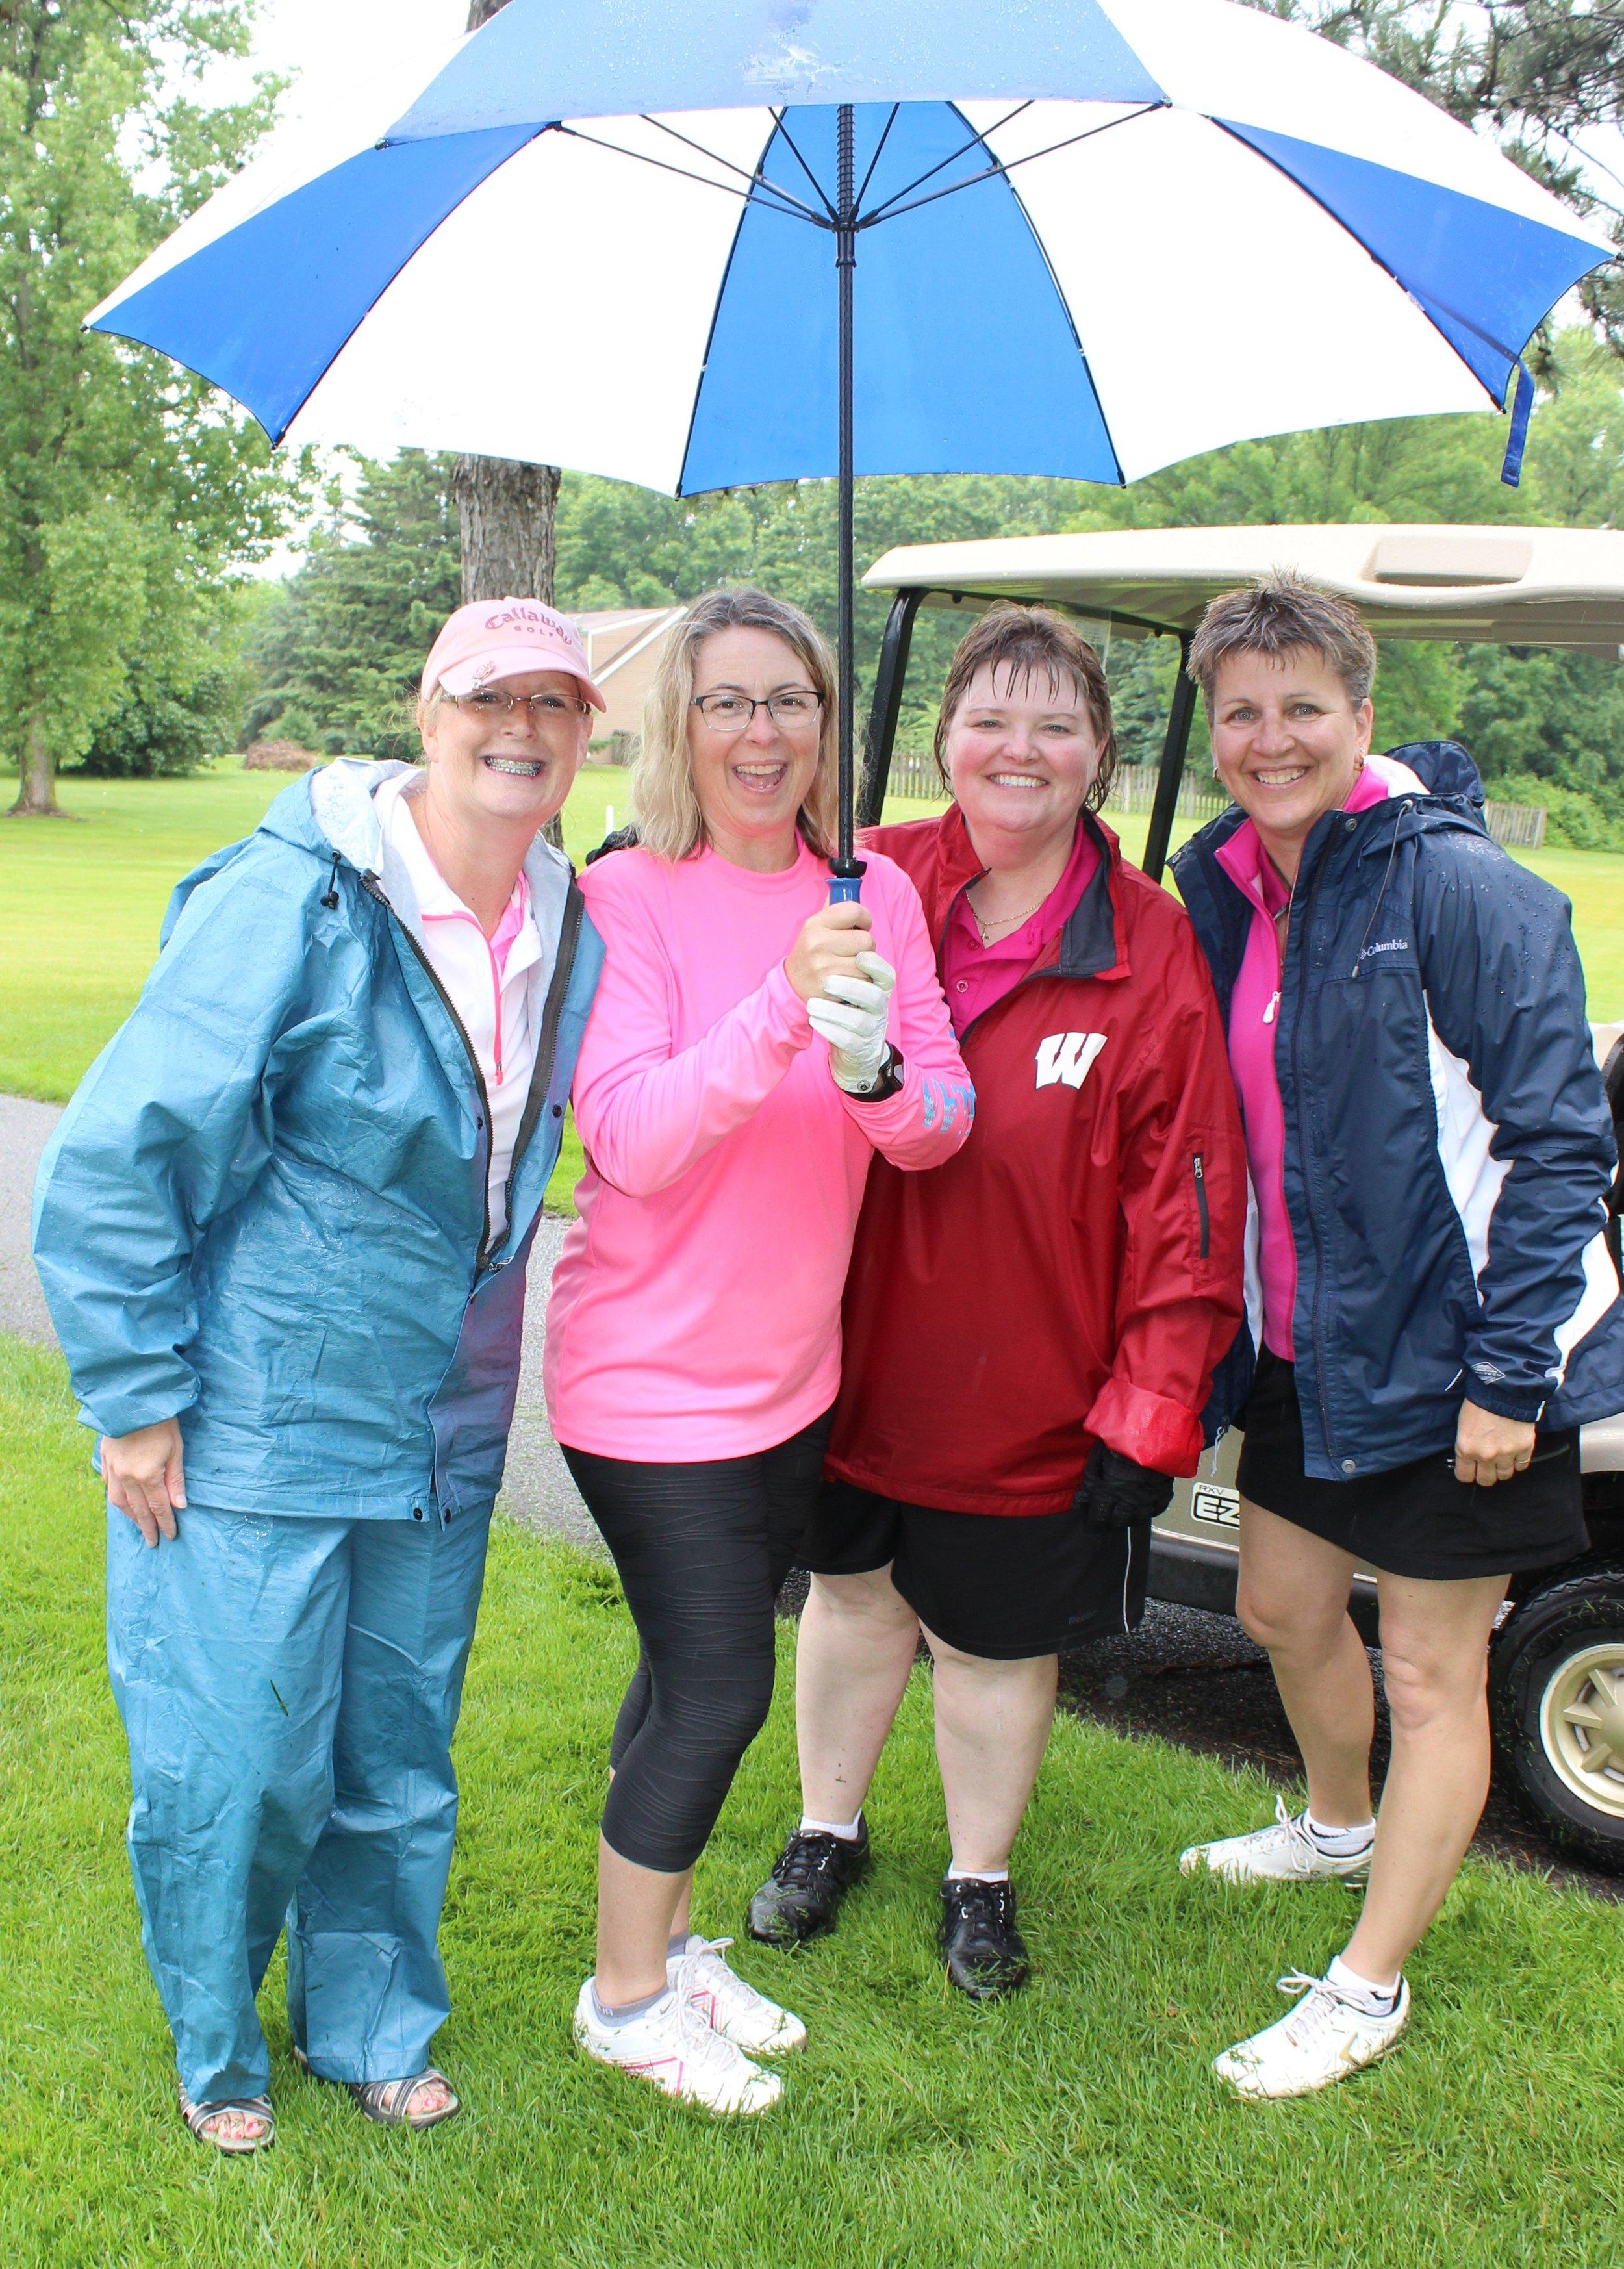 5B Mischell Fryar, Debbie Wedding, Kim Woodkey, Kari Winkler.jpg